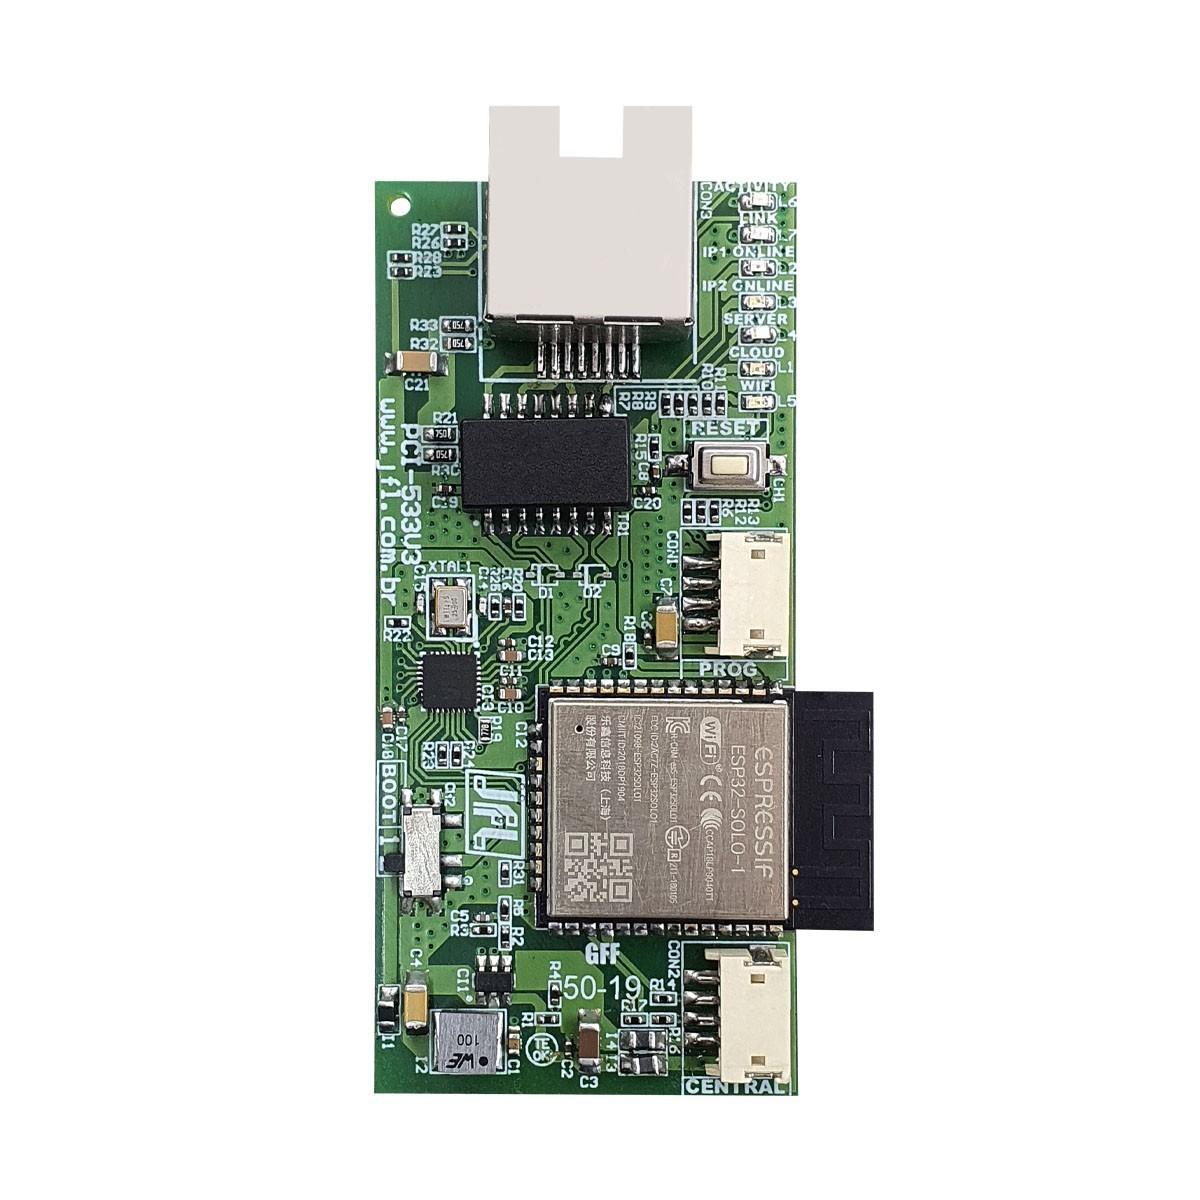 Kit Alarme Monitora Active 32 Duo Com Sensores Lz 500 Jfl